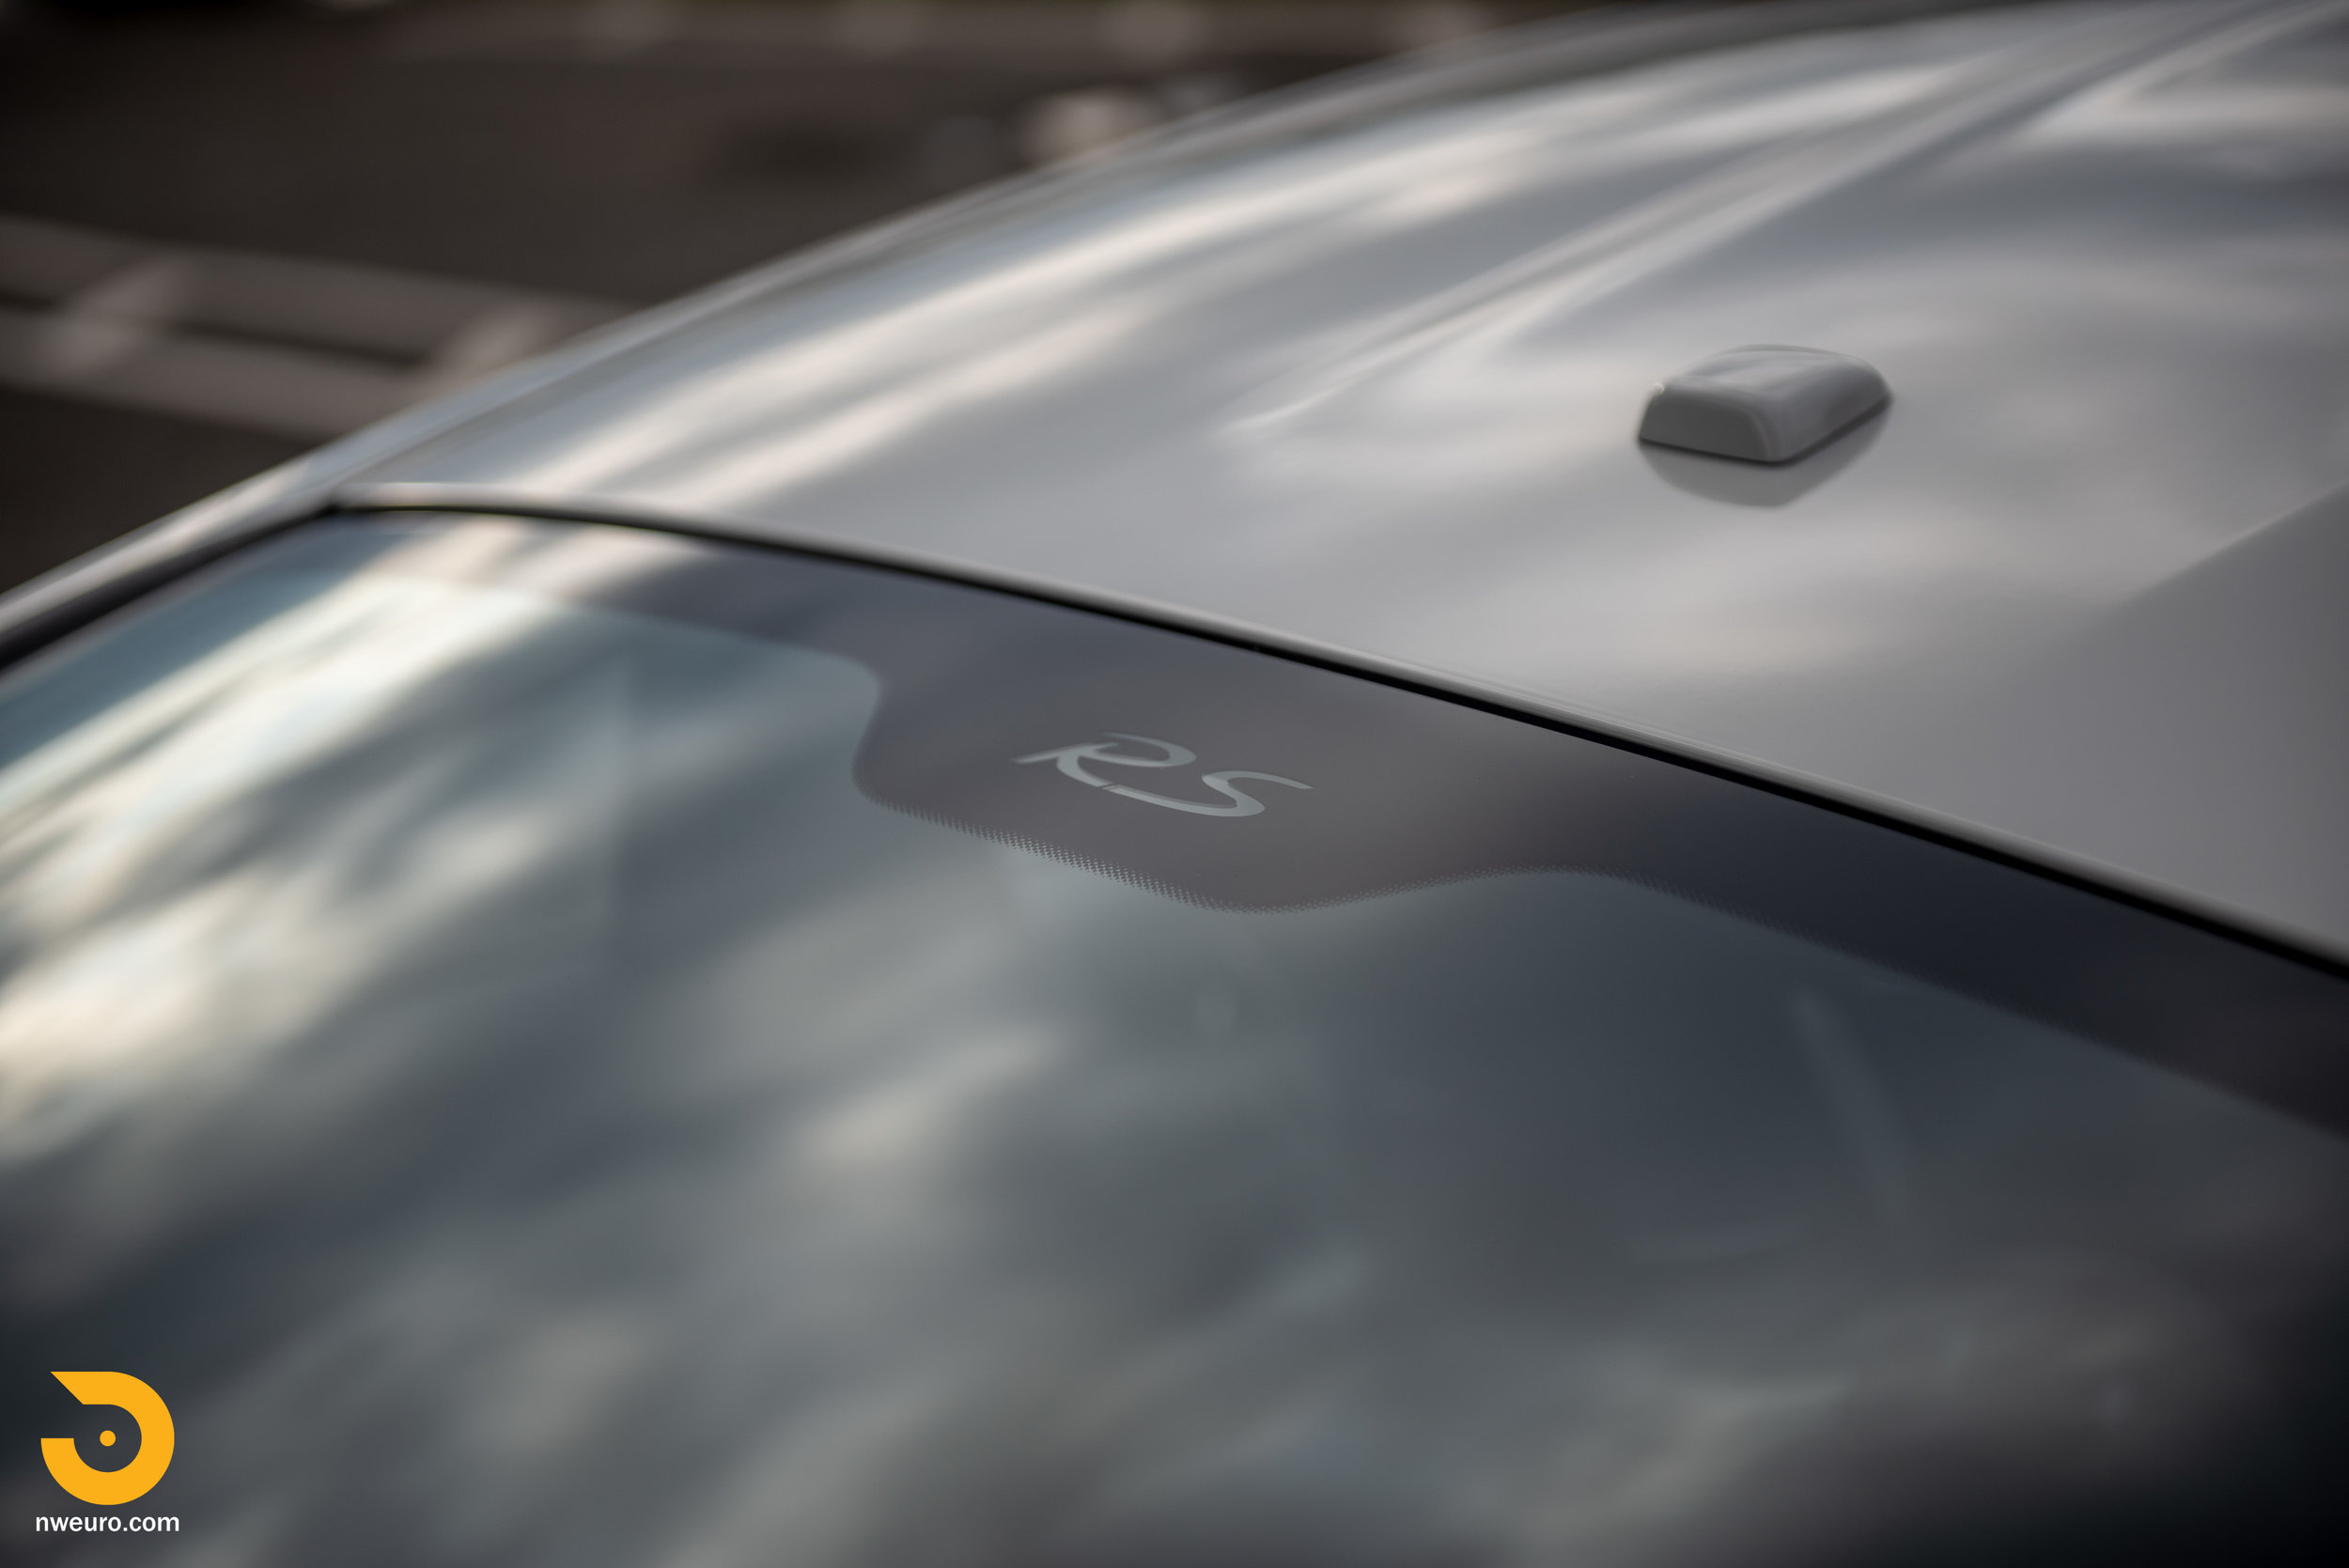 2019 Porsche GT3 RS - Chalk-12.jpg